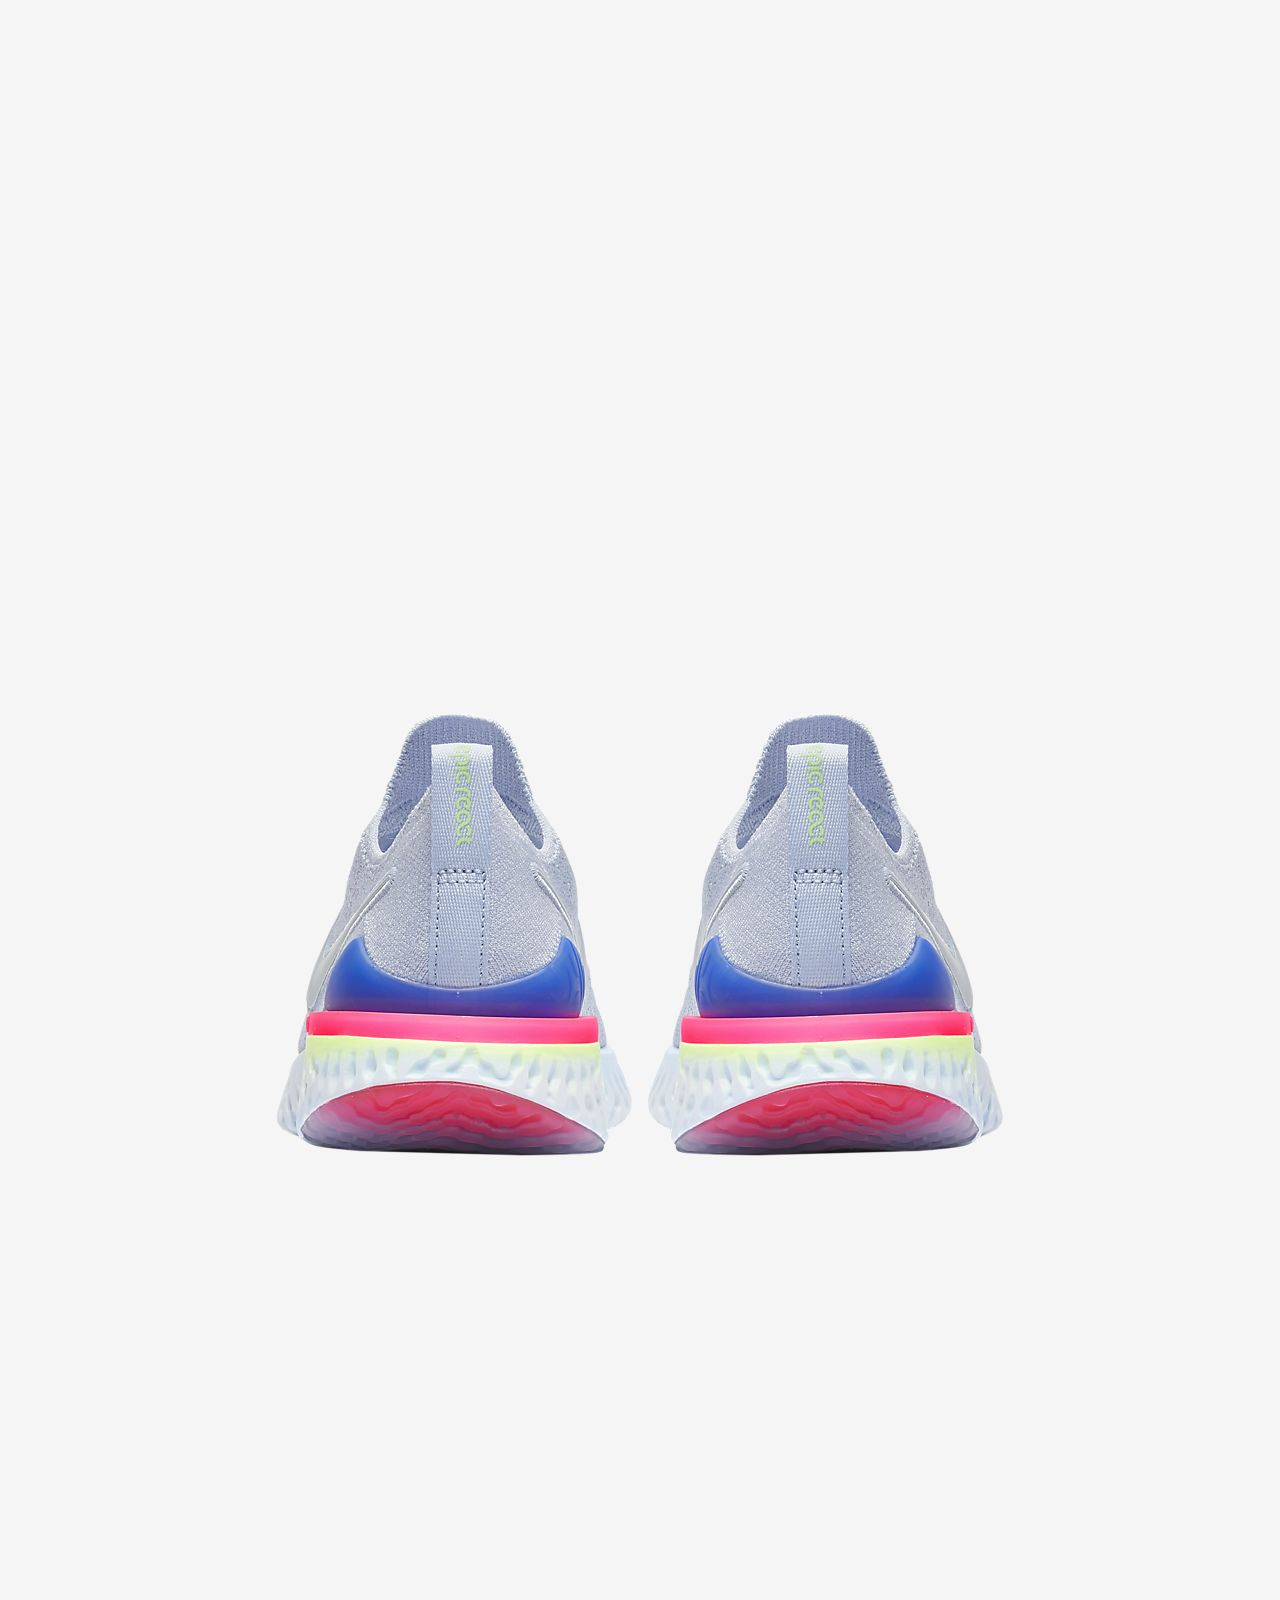 2c5c3b6b51cb Nike Epic React Flyknit 2 Older Kids  Running Shoe. Nike.com GB